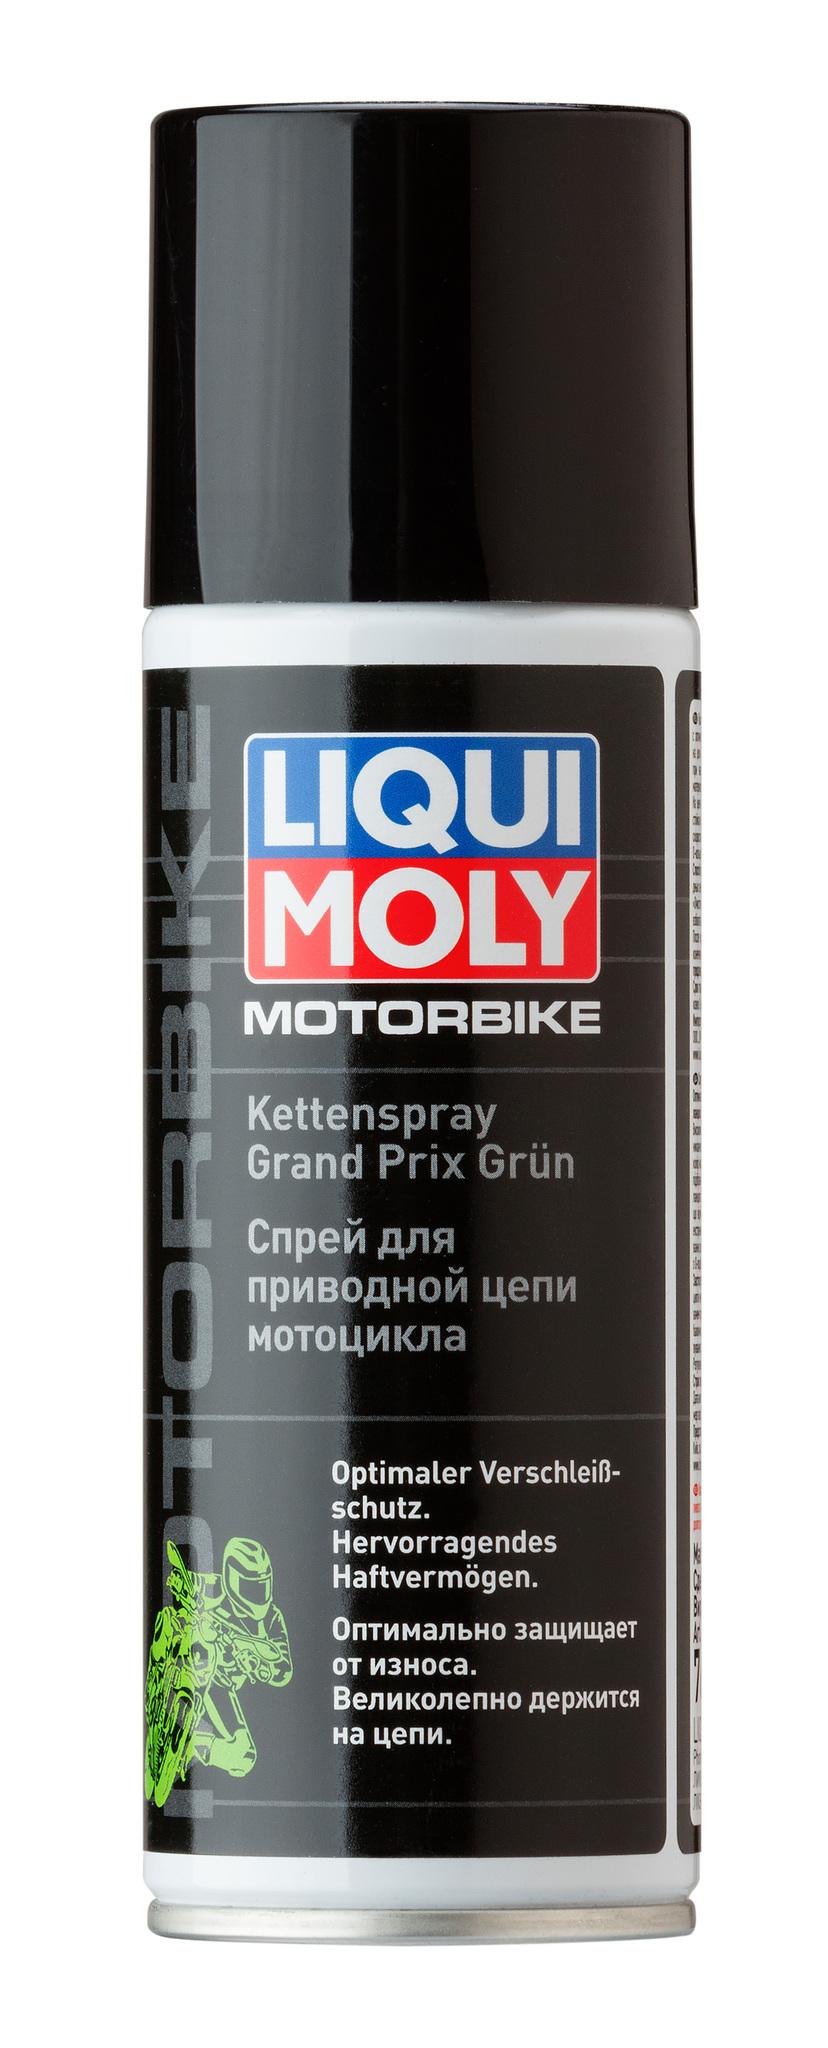 Liqui Moly Motorrad Kettenspray Grand Prix Grun Спрей для приводной цепи мотоцикла (зеленый)